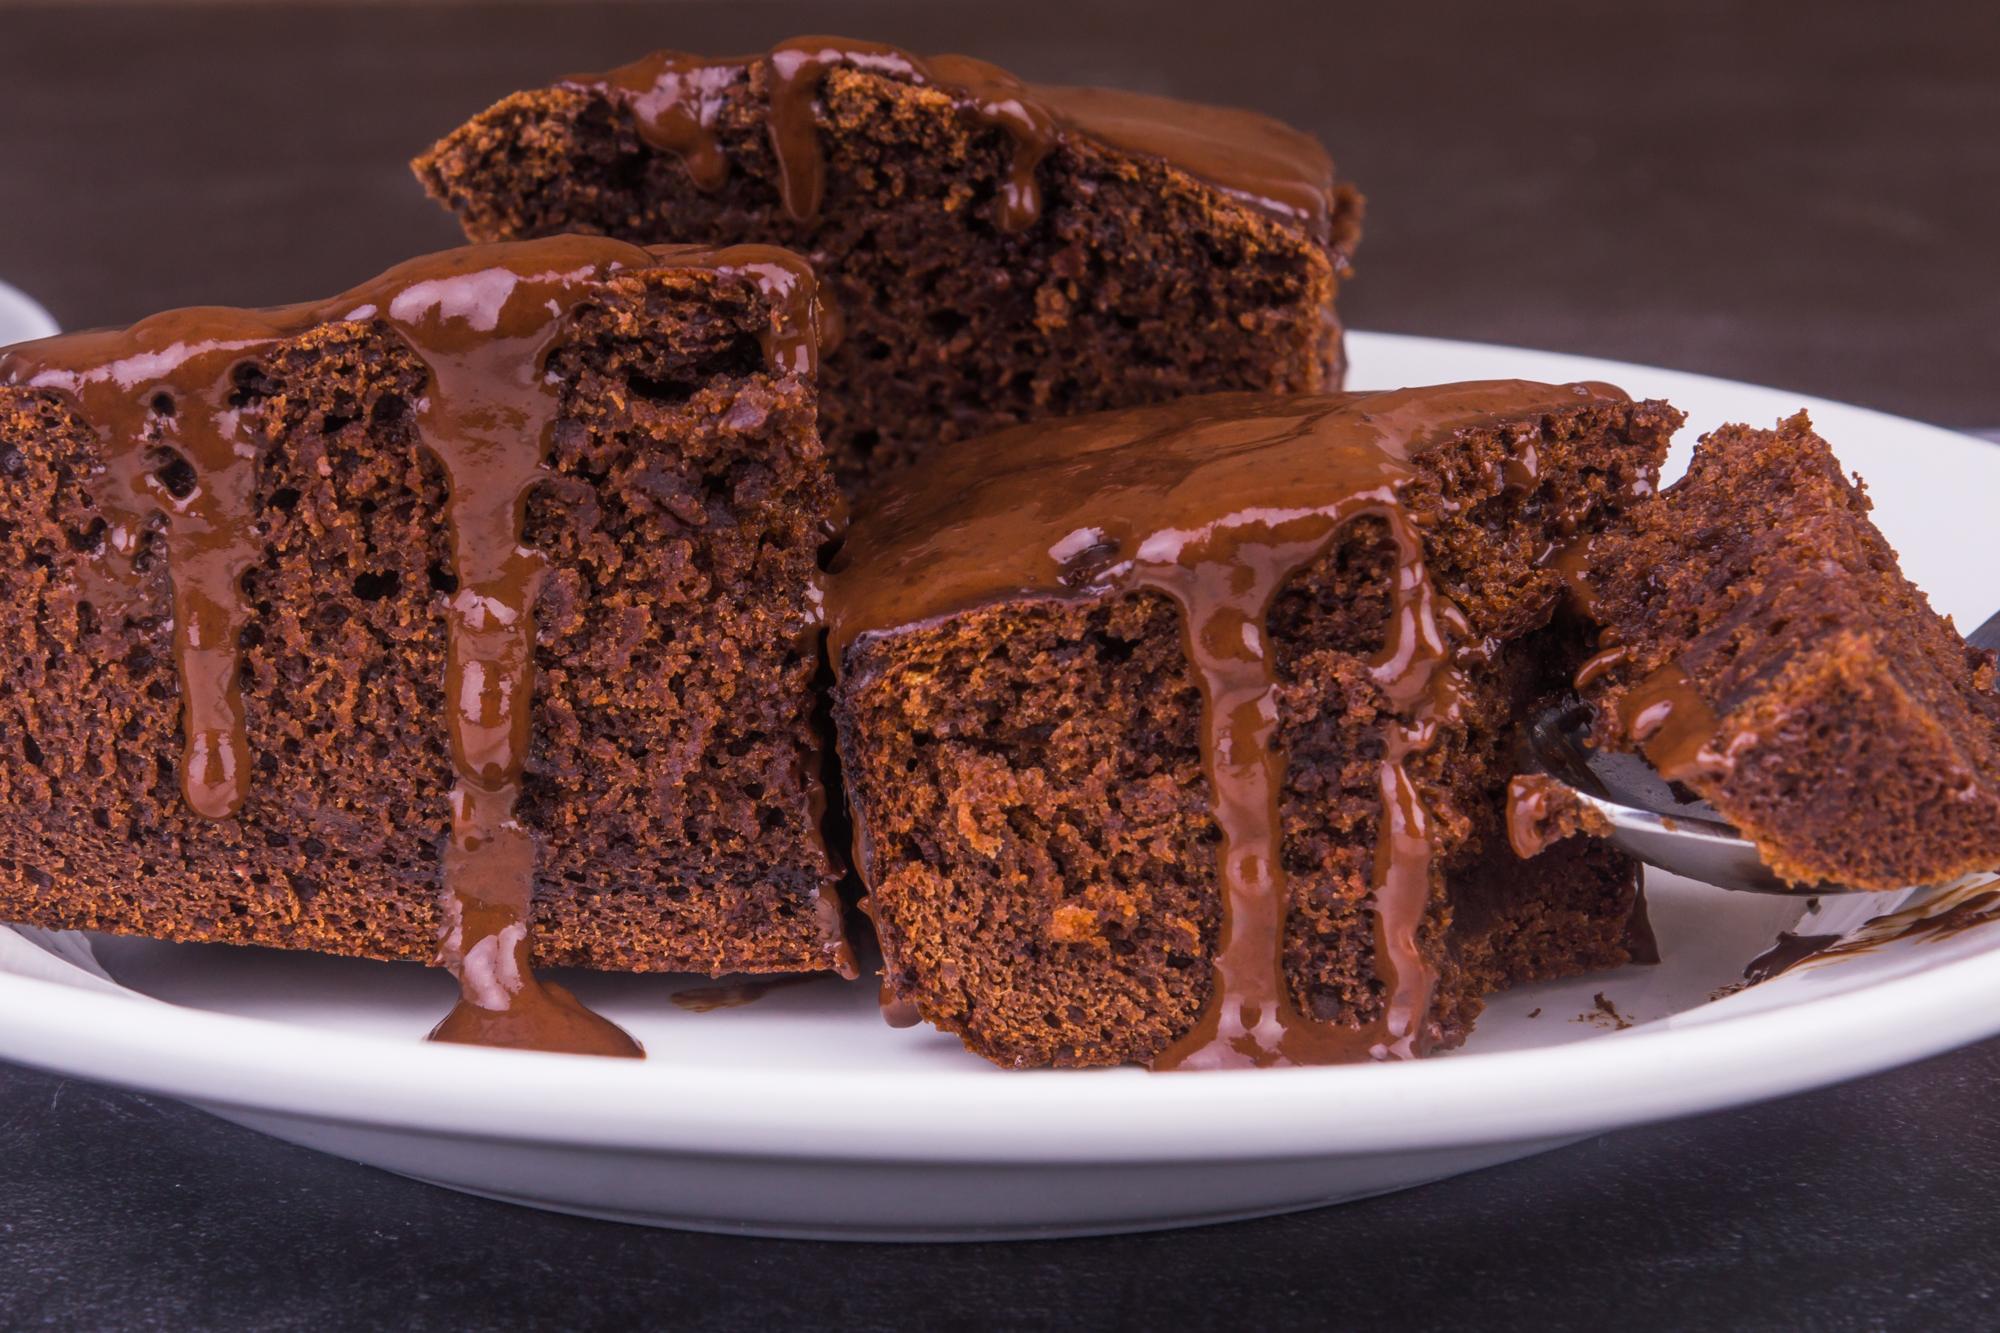 Фото шоколадного кекса